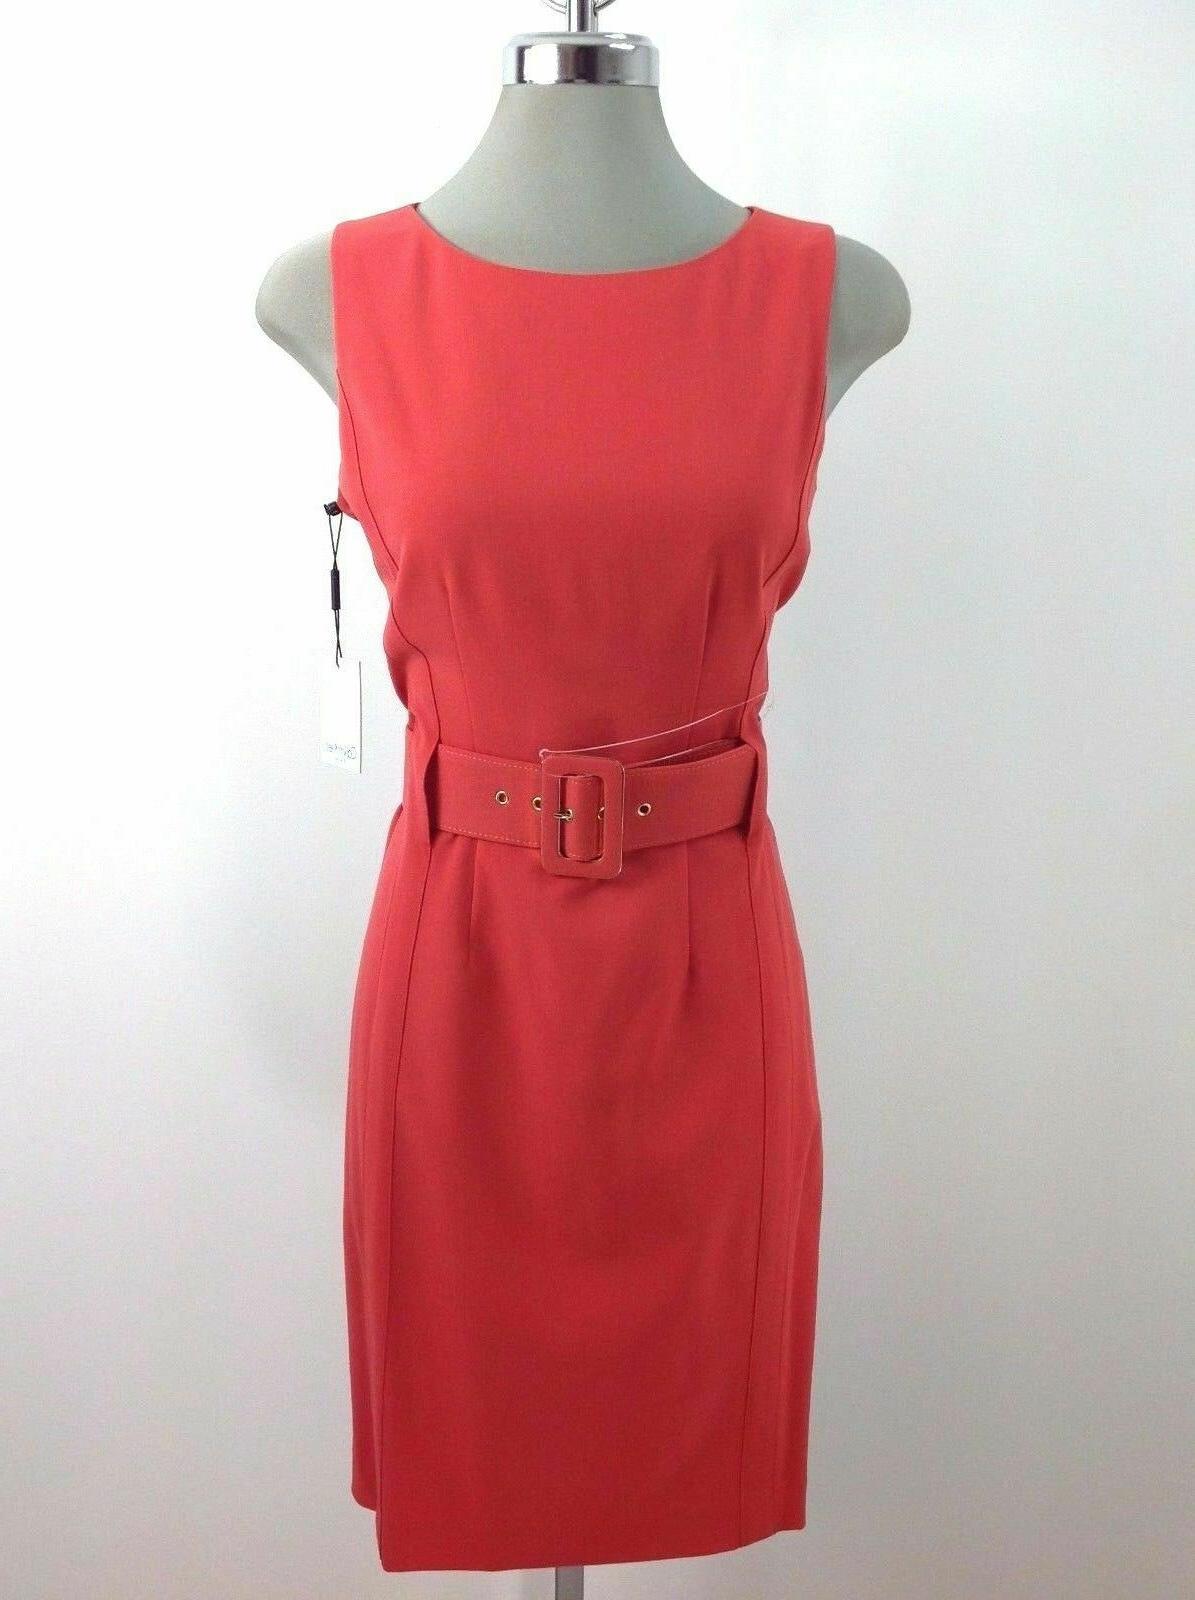 nwt elegant red dress wide waist belt